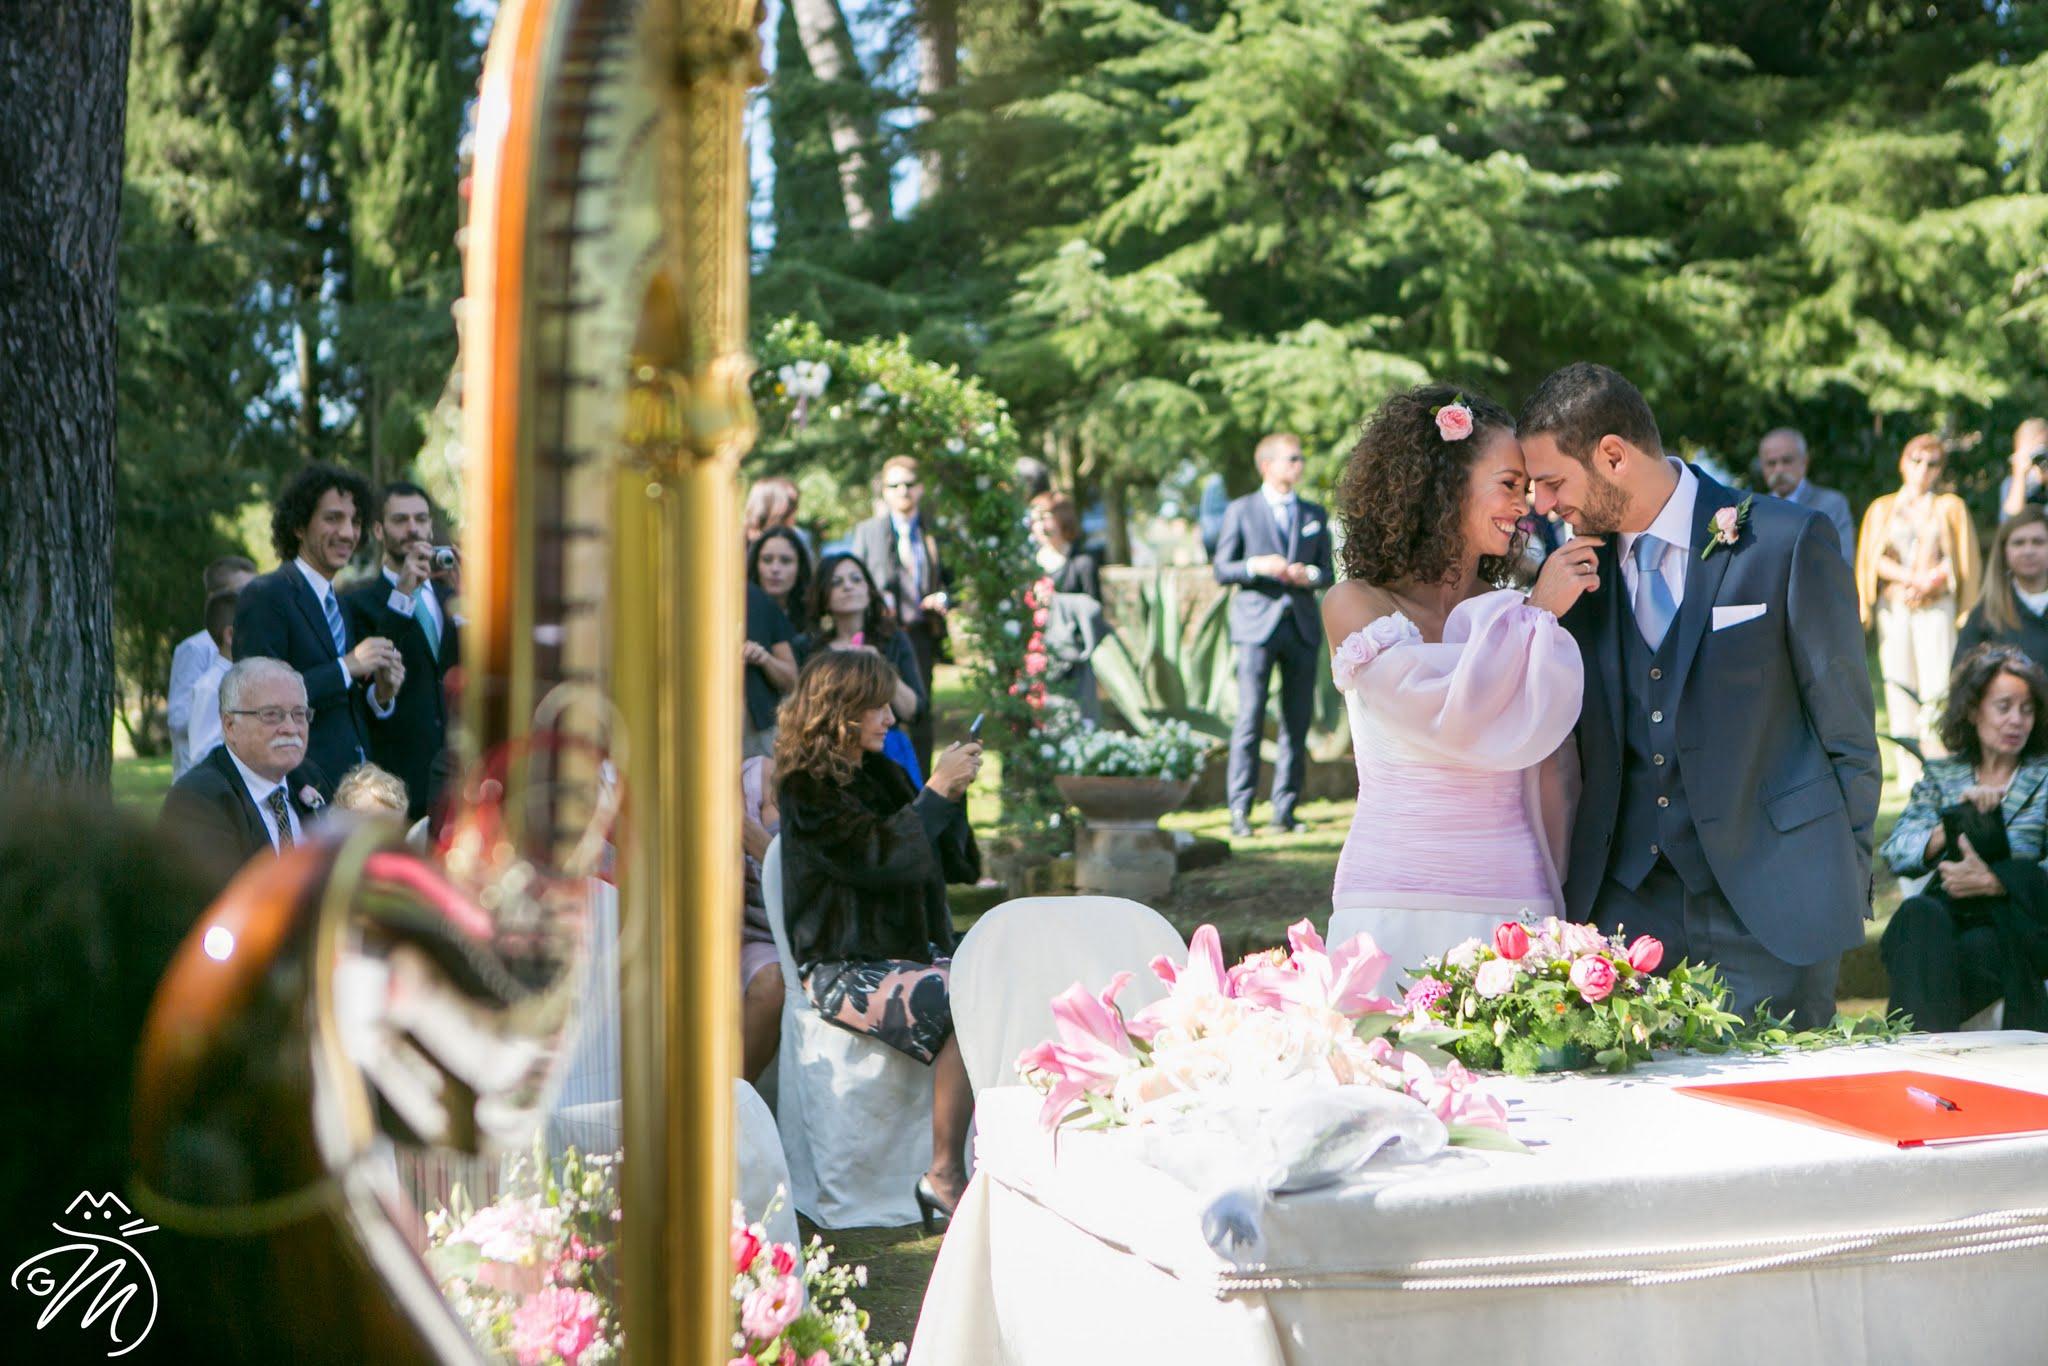 fotografo matrimonio Roma photographer in Italy ORIZZONTALI2_LOGO_HOME_PAGE_INTERNATIONAL_PHOTOGRAPHER_IN_ROME_WEDDING_DESTINATION_GIROLAMO_MONTELEONE_-43